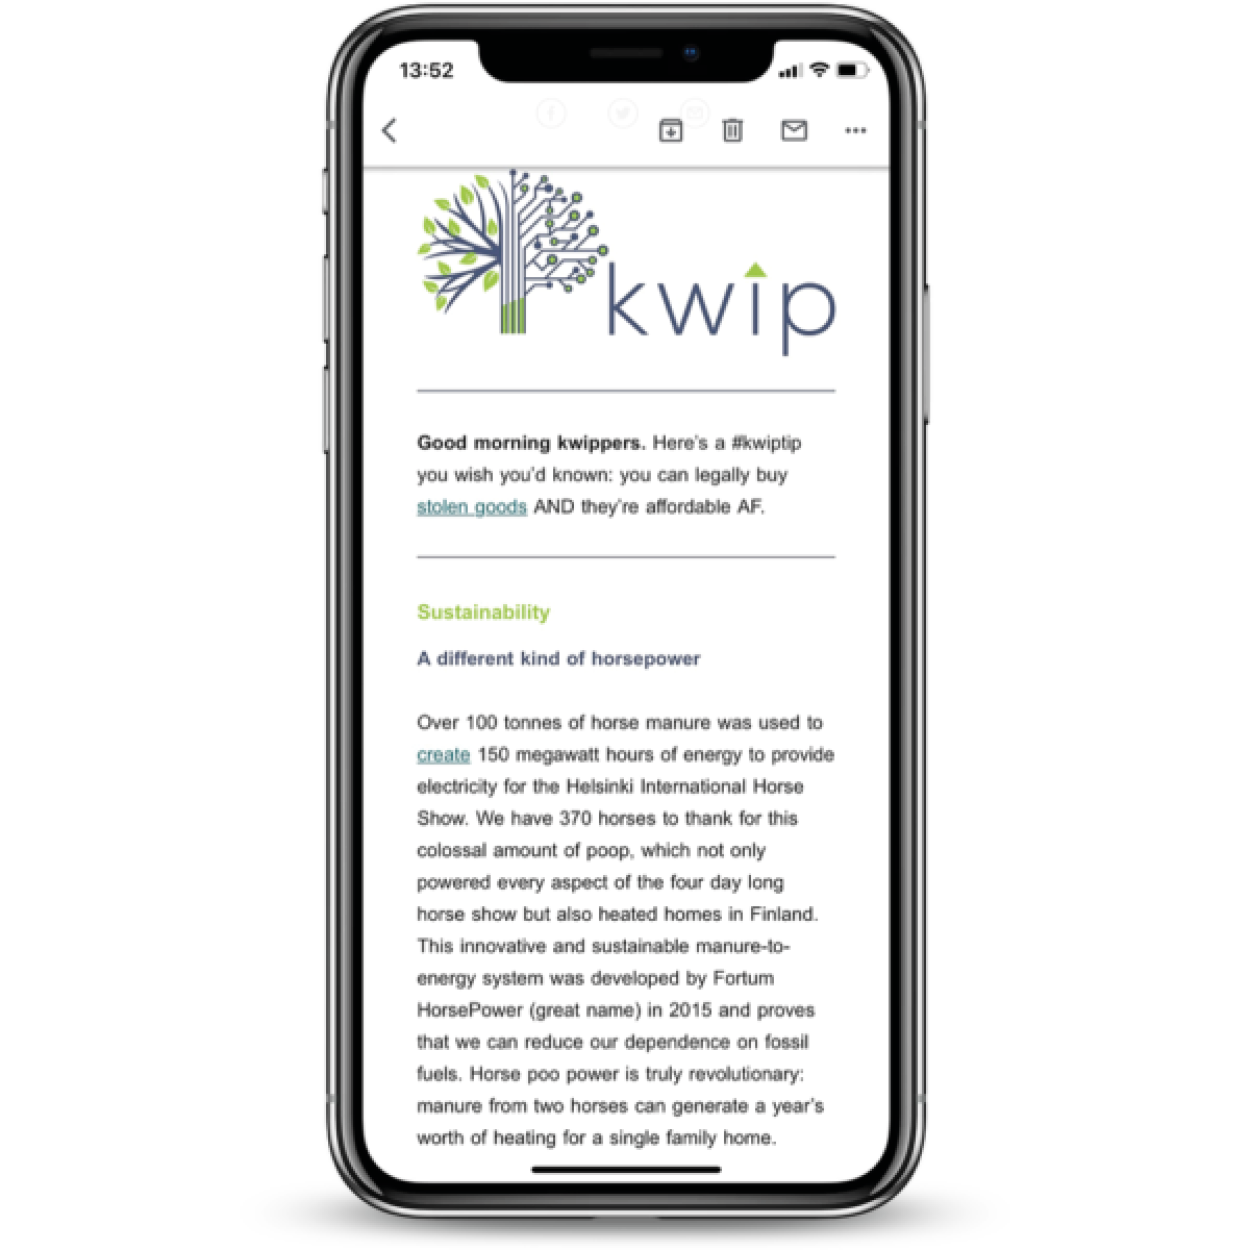 kwip newsletter shown on a smartphone